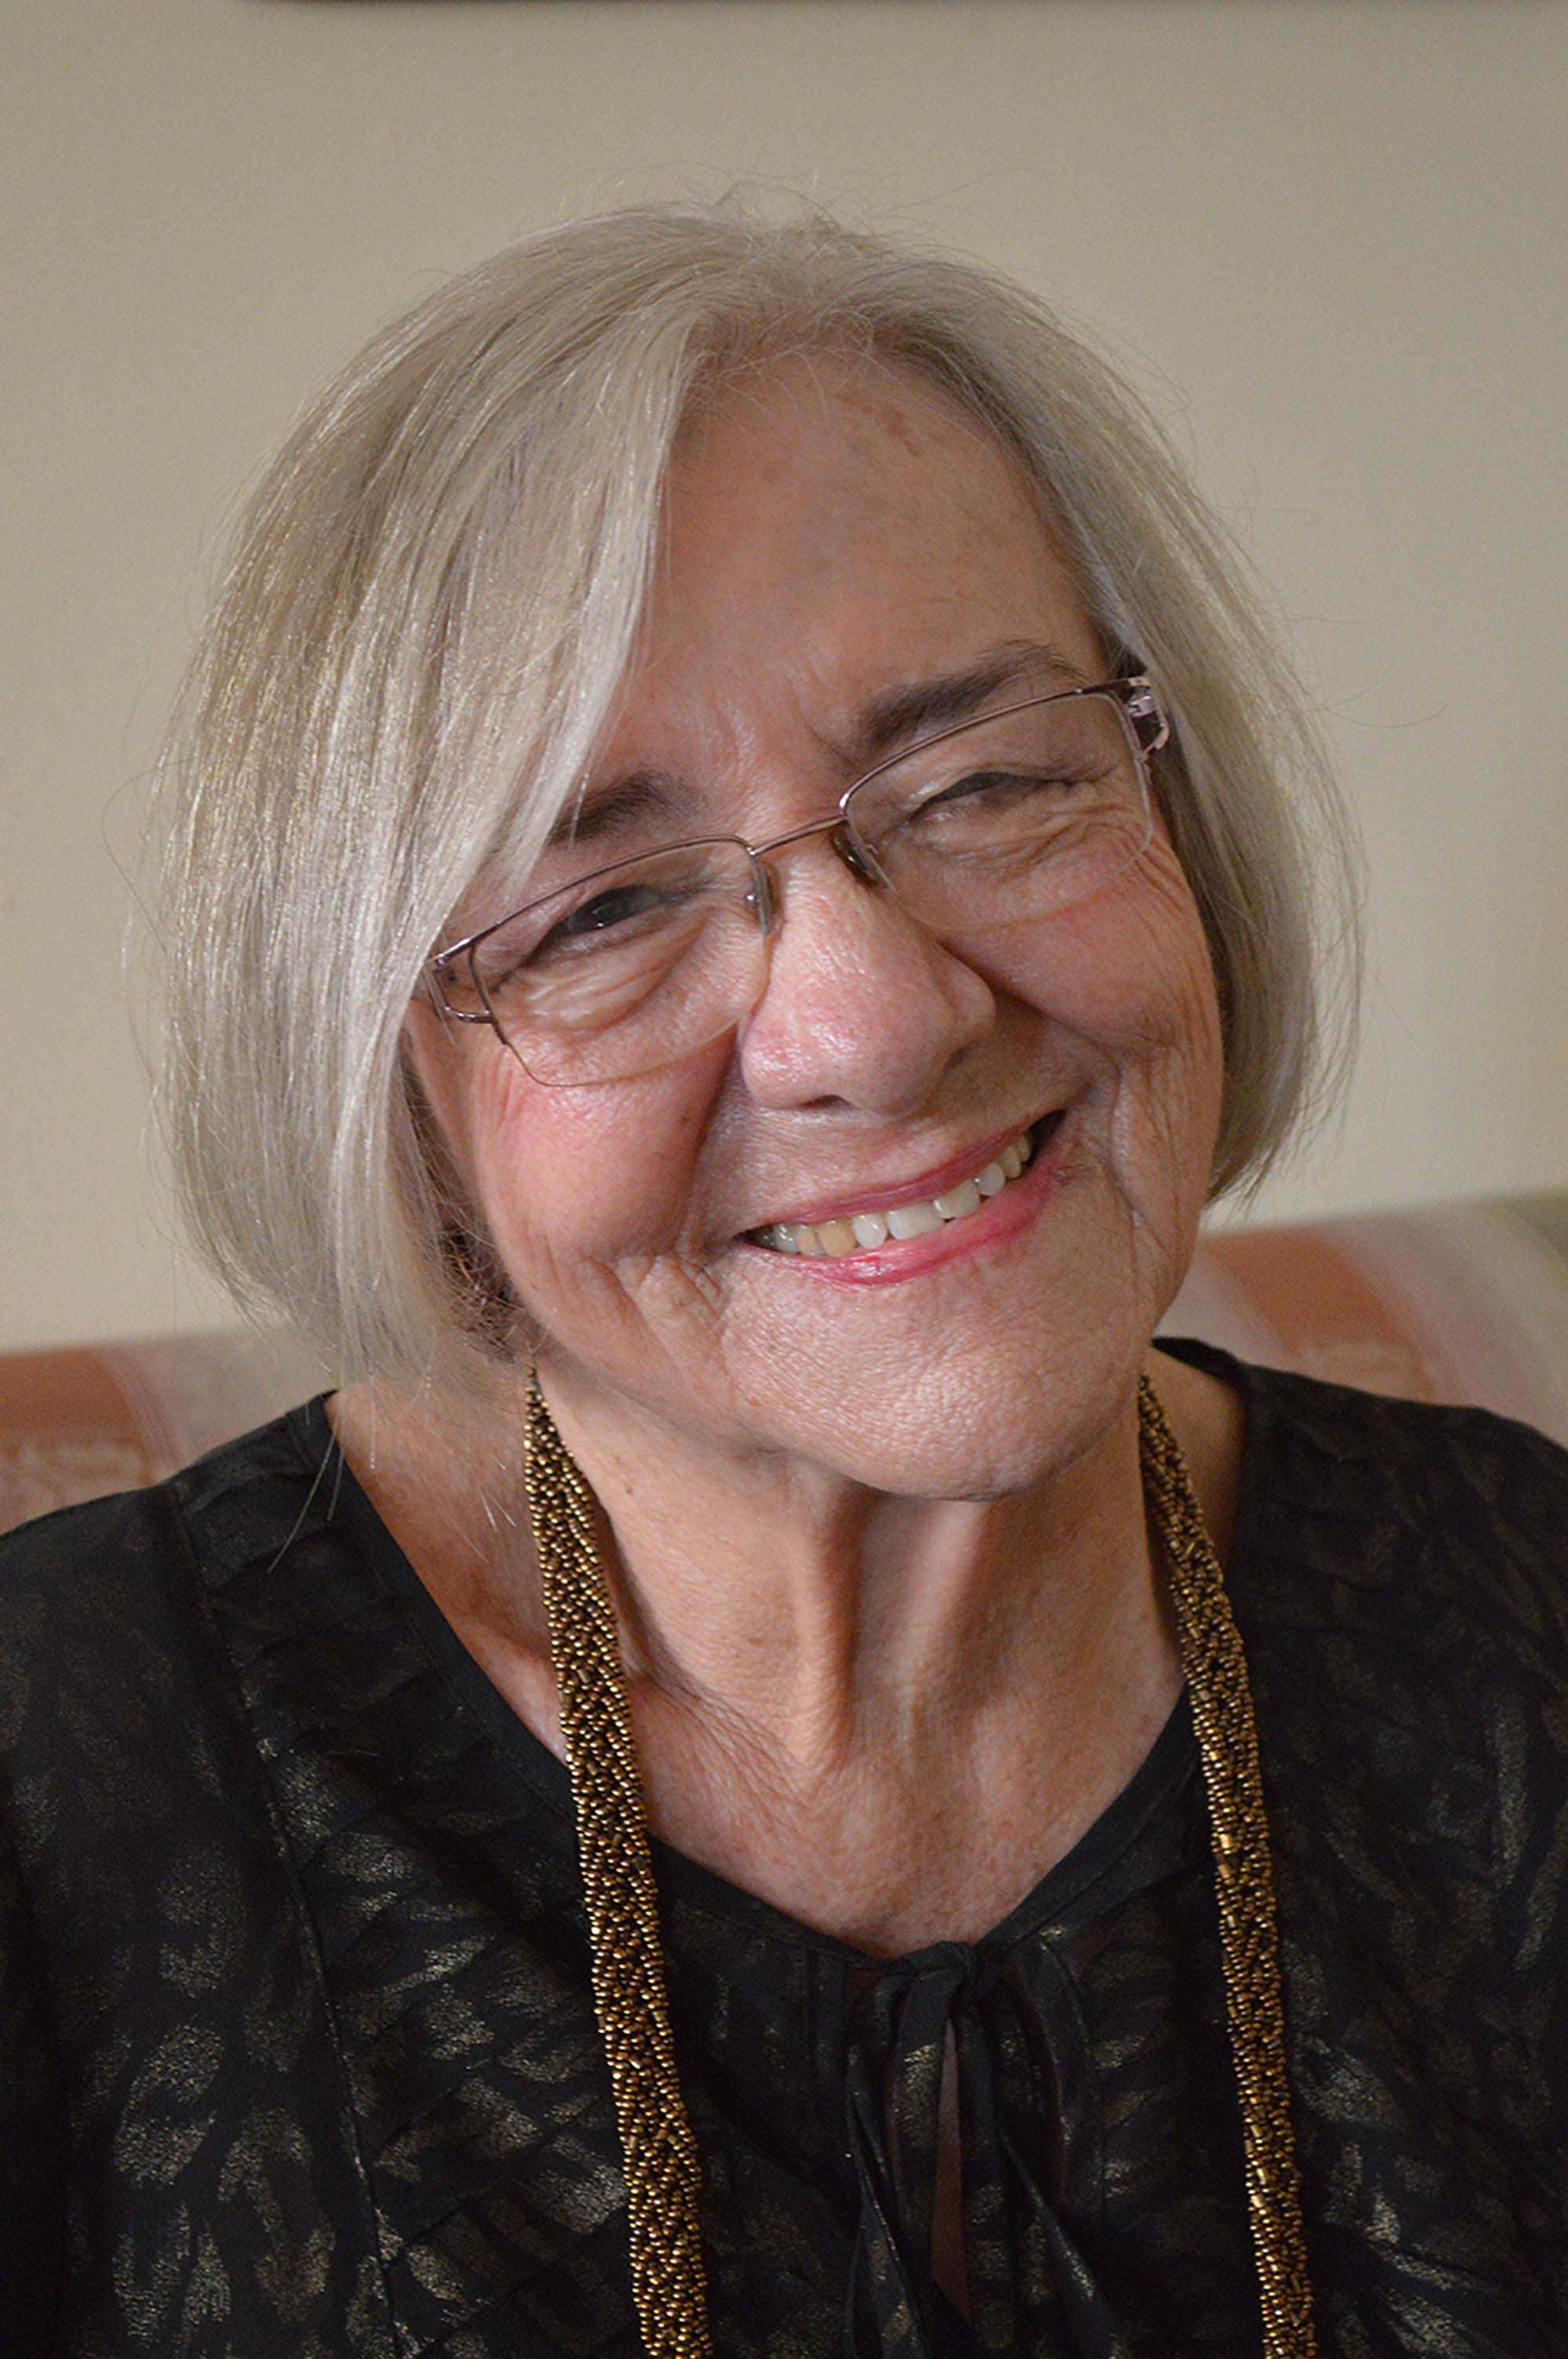 Alicia Echeverri García